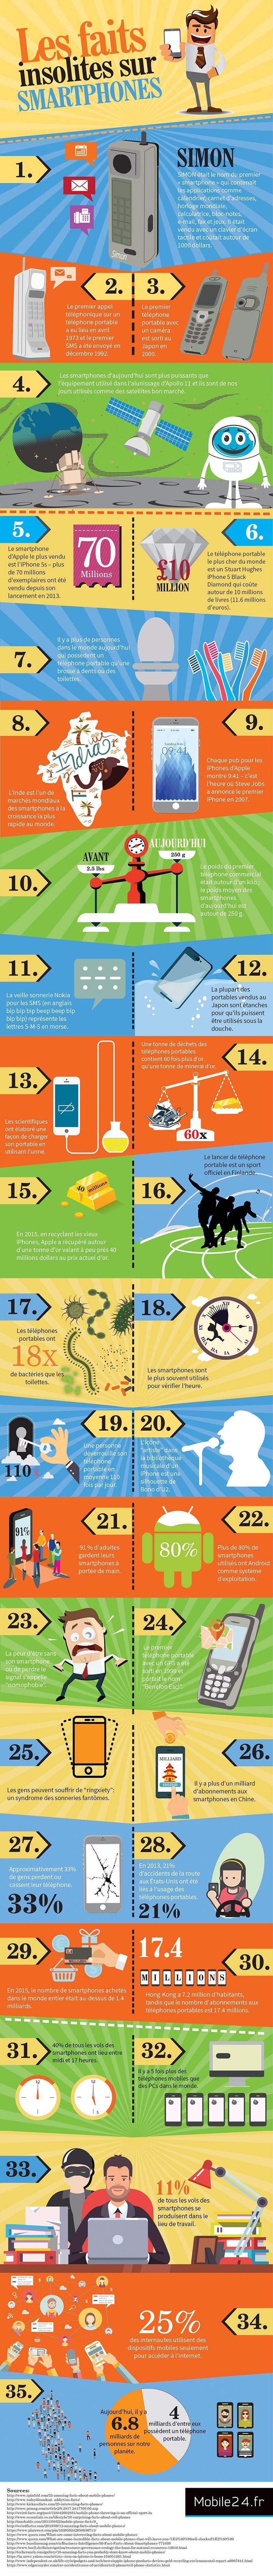 infographie : 35 faits insolites smartphones